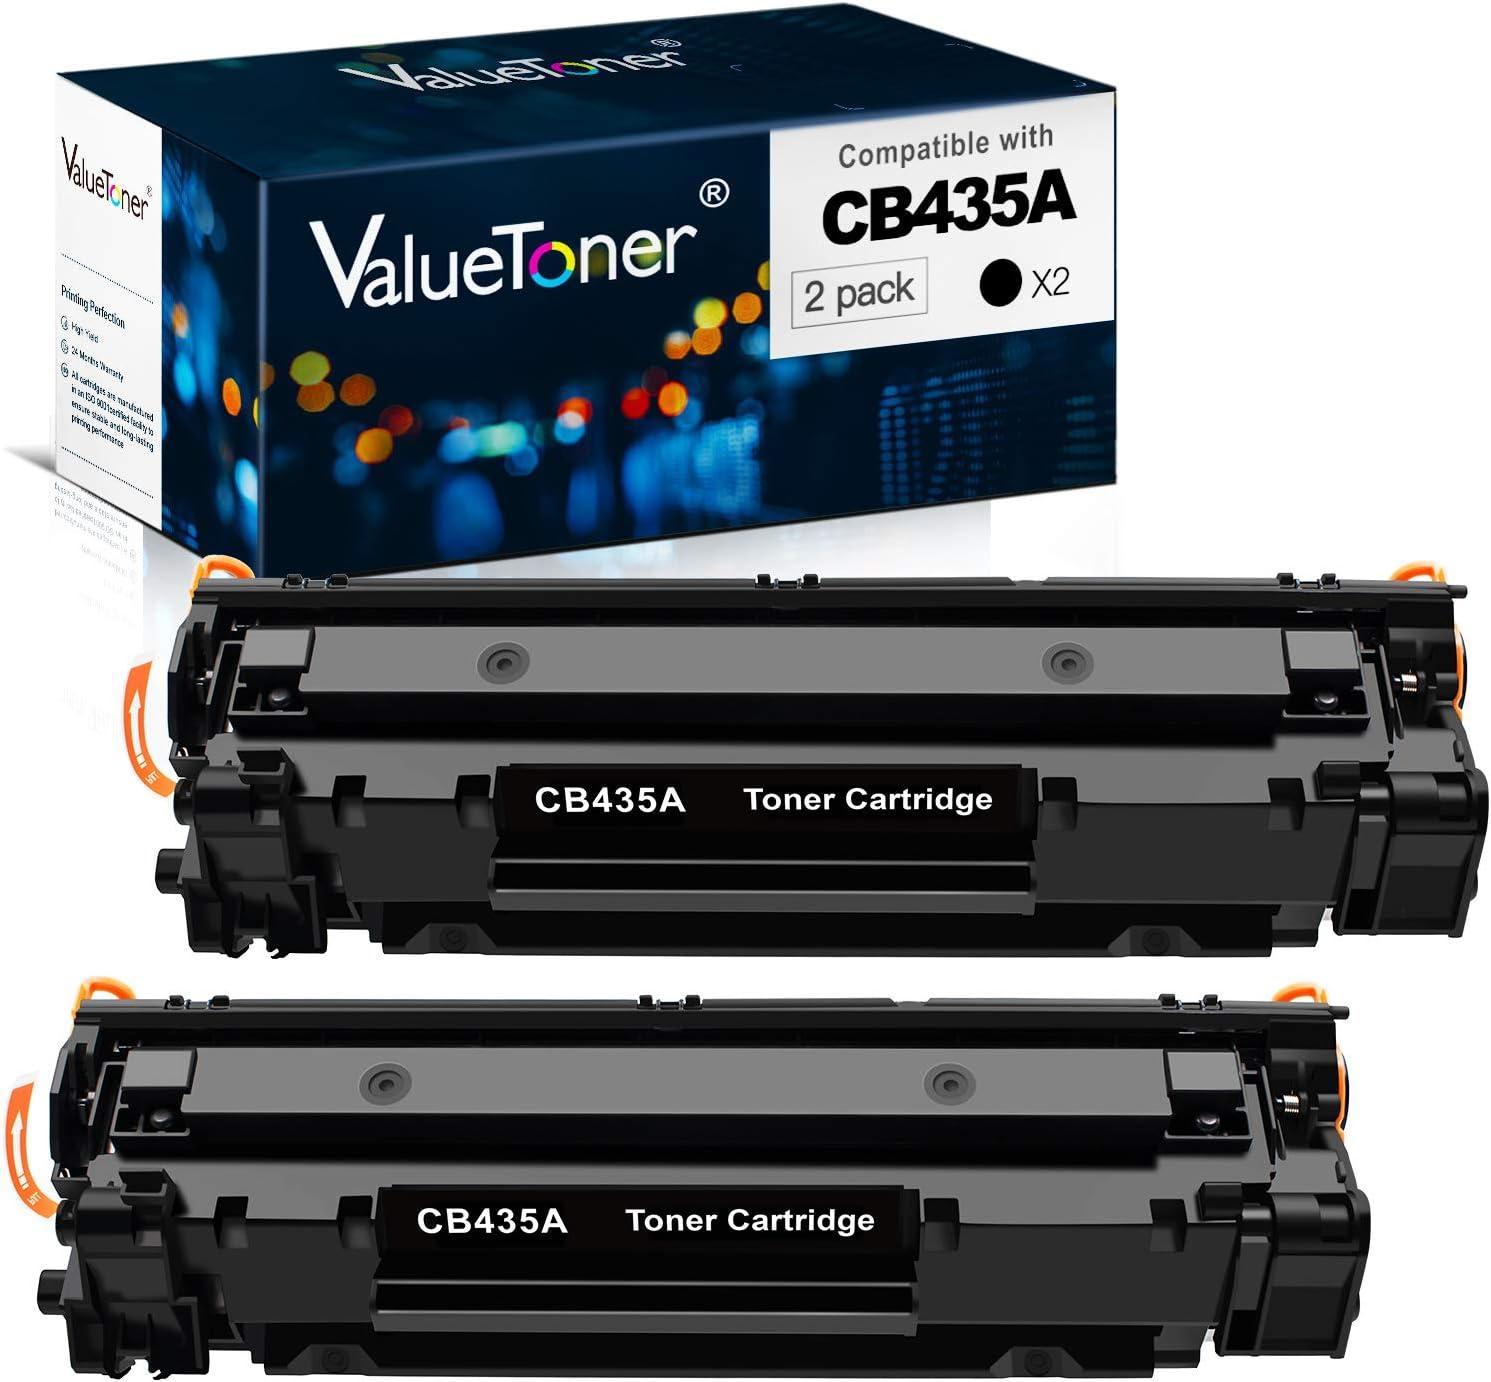 Valuetoner Compatible Toner Cartridge Replacement for HP 35A CB435A for LaserJet P1006, P1009, P1002, P1003, P1004, P1005 Laser Printer (Black, 2 Pack)